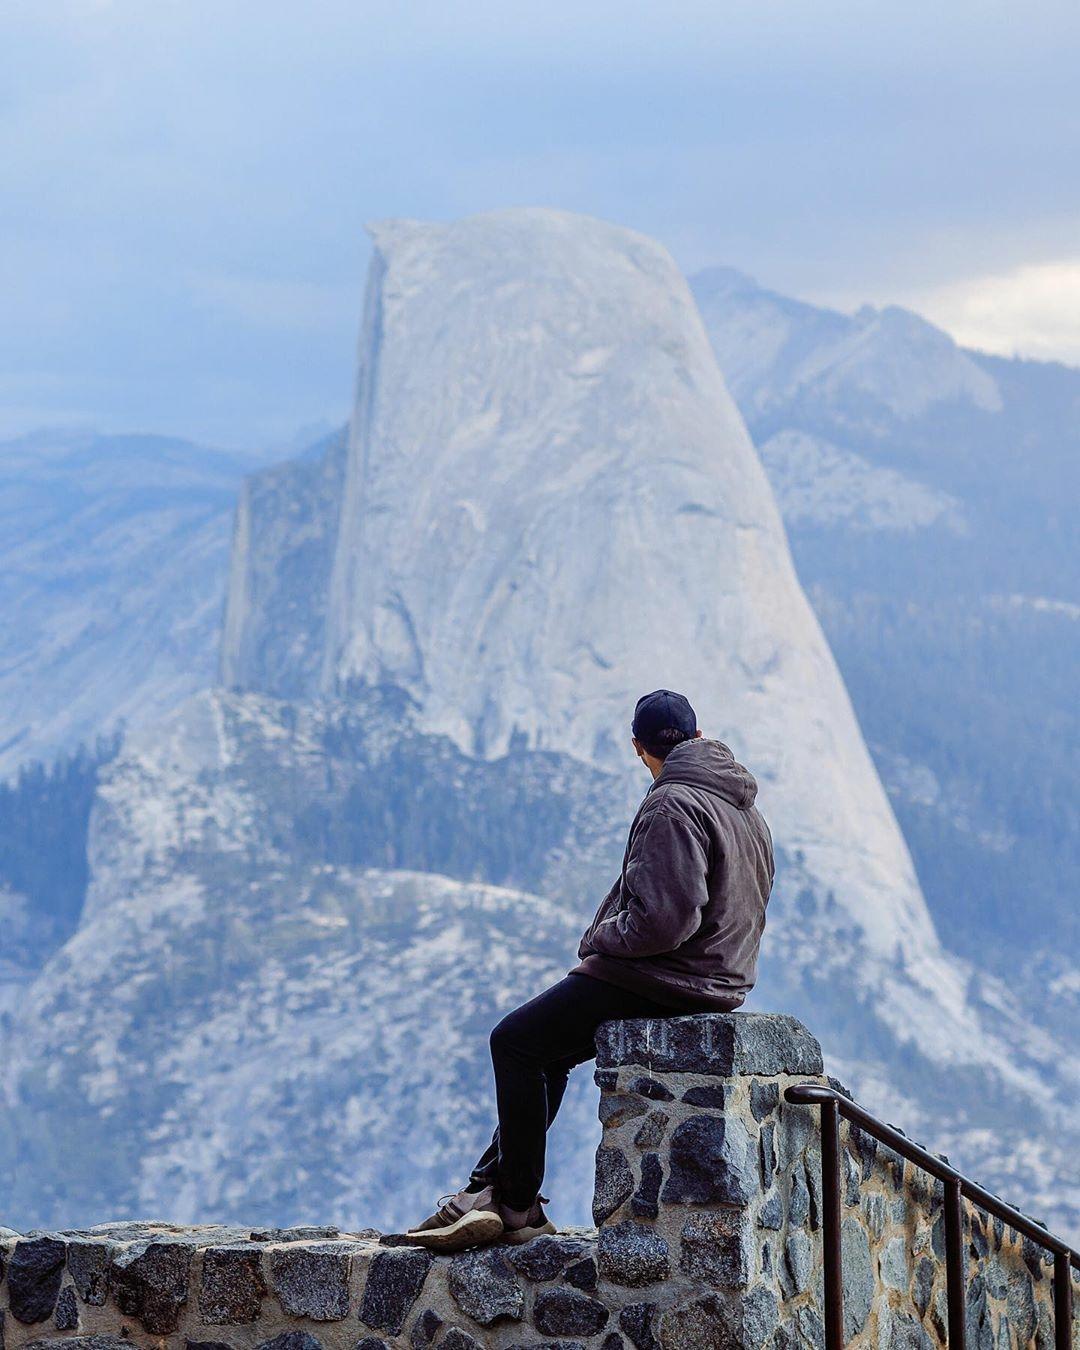 Washburn Point Yosemite National Park